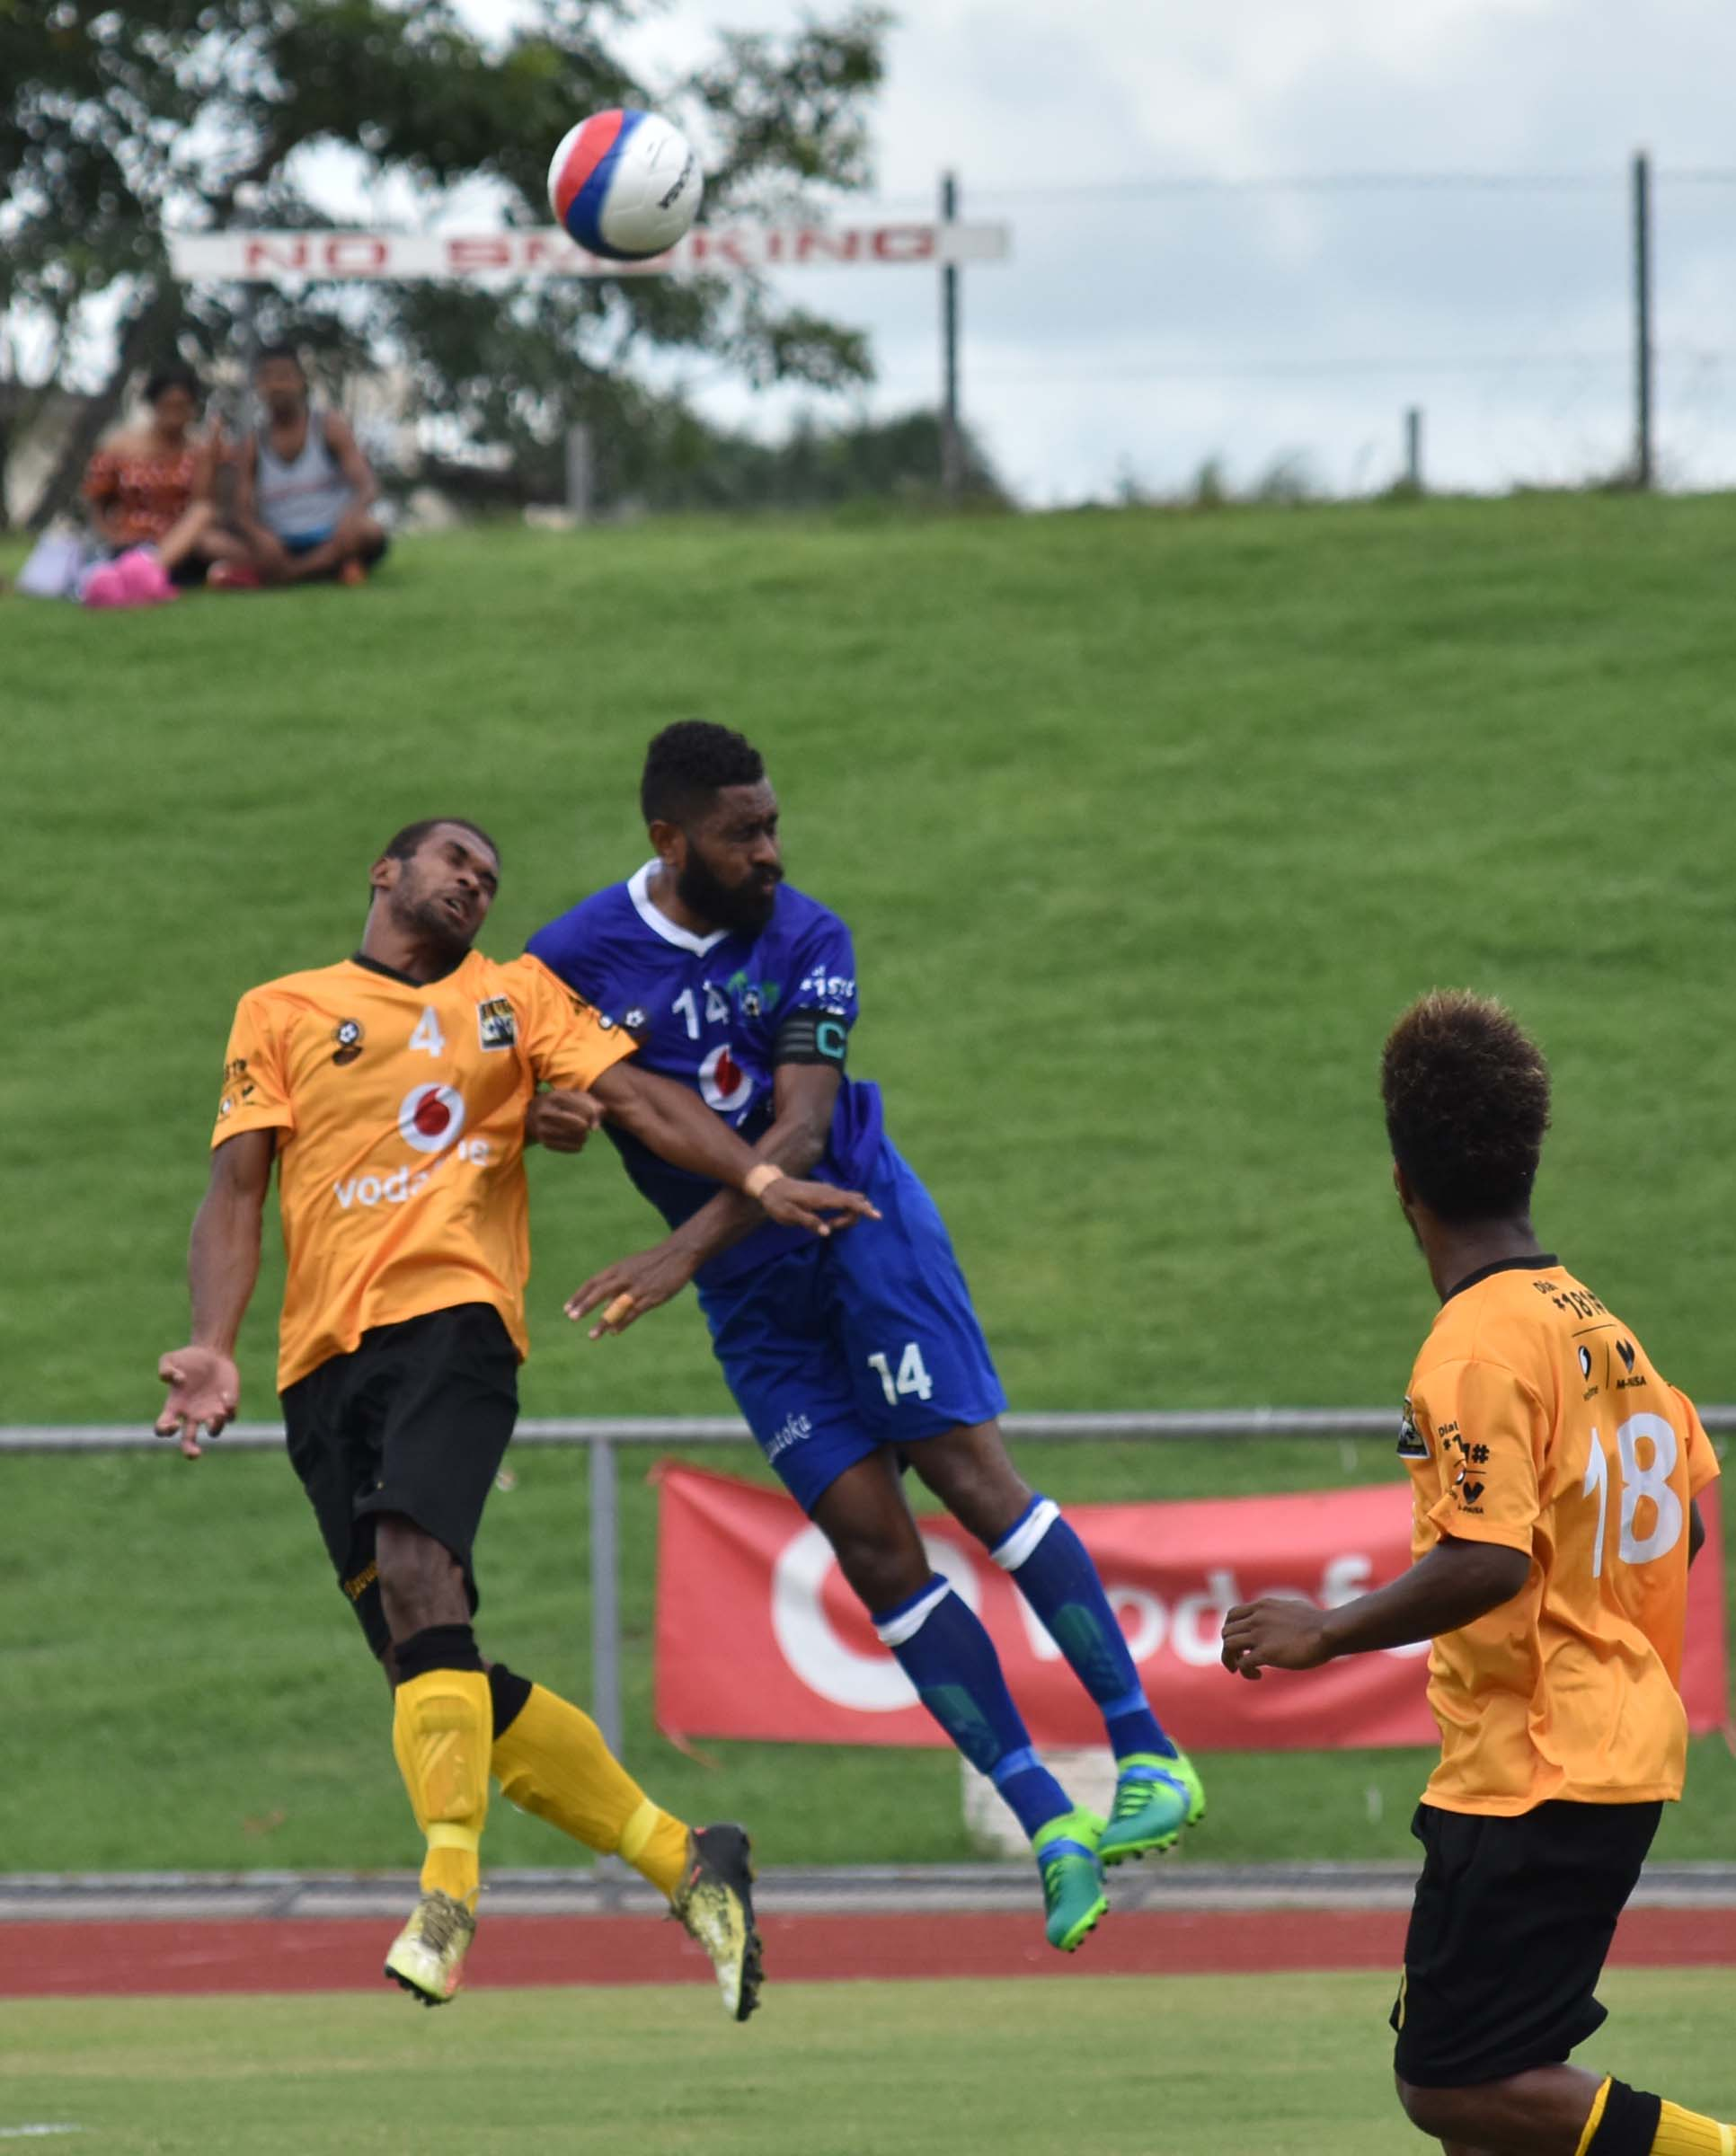 Lautoka's Samuela Drudru ina ction against Tavua in the Vodafone Premier League on January 20, 2019. Photo: Waisea Nasokia